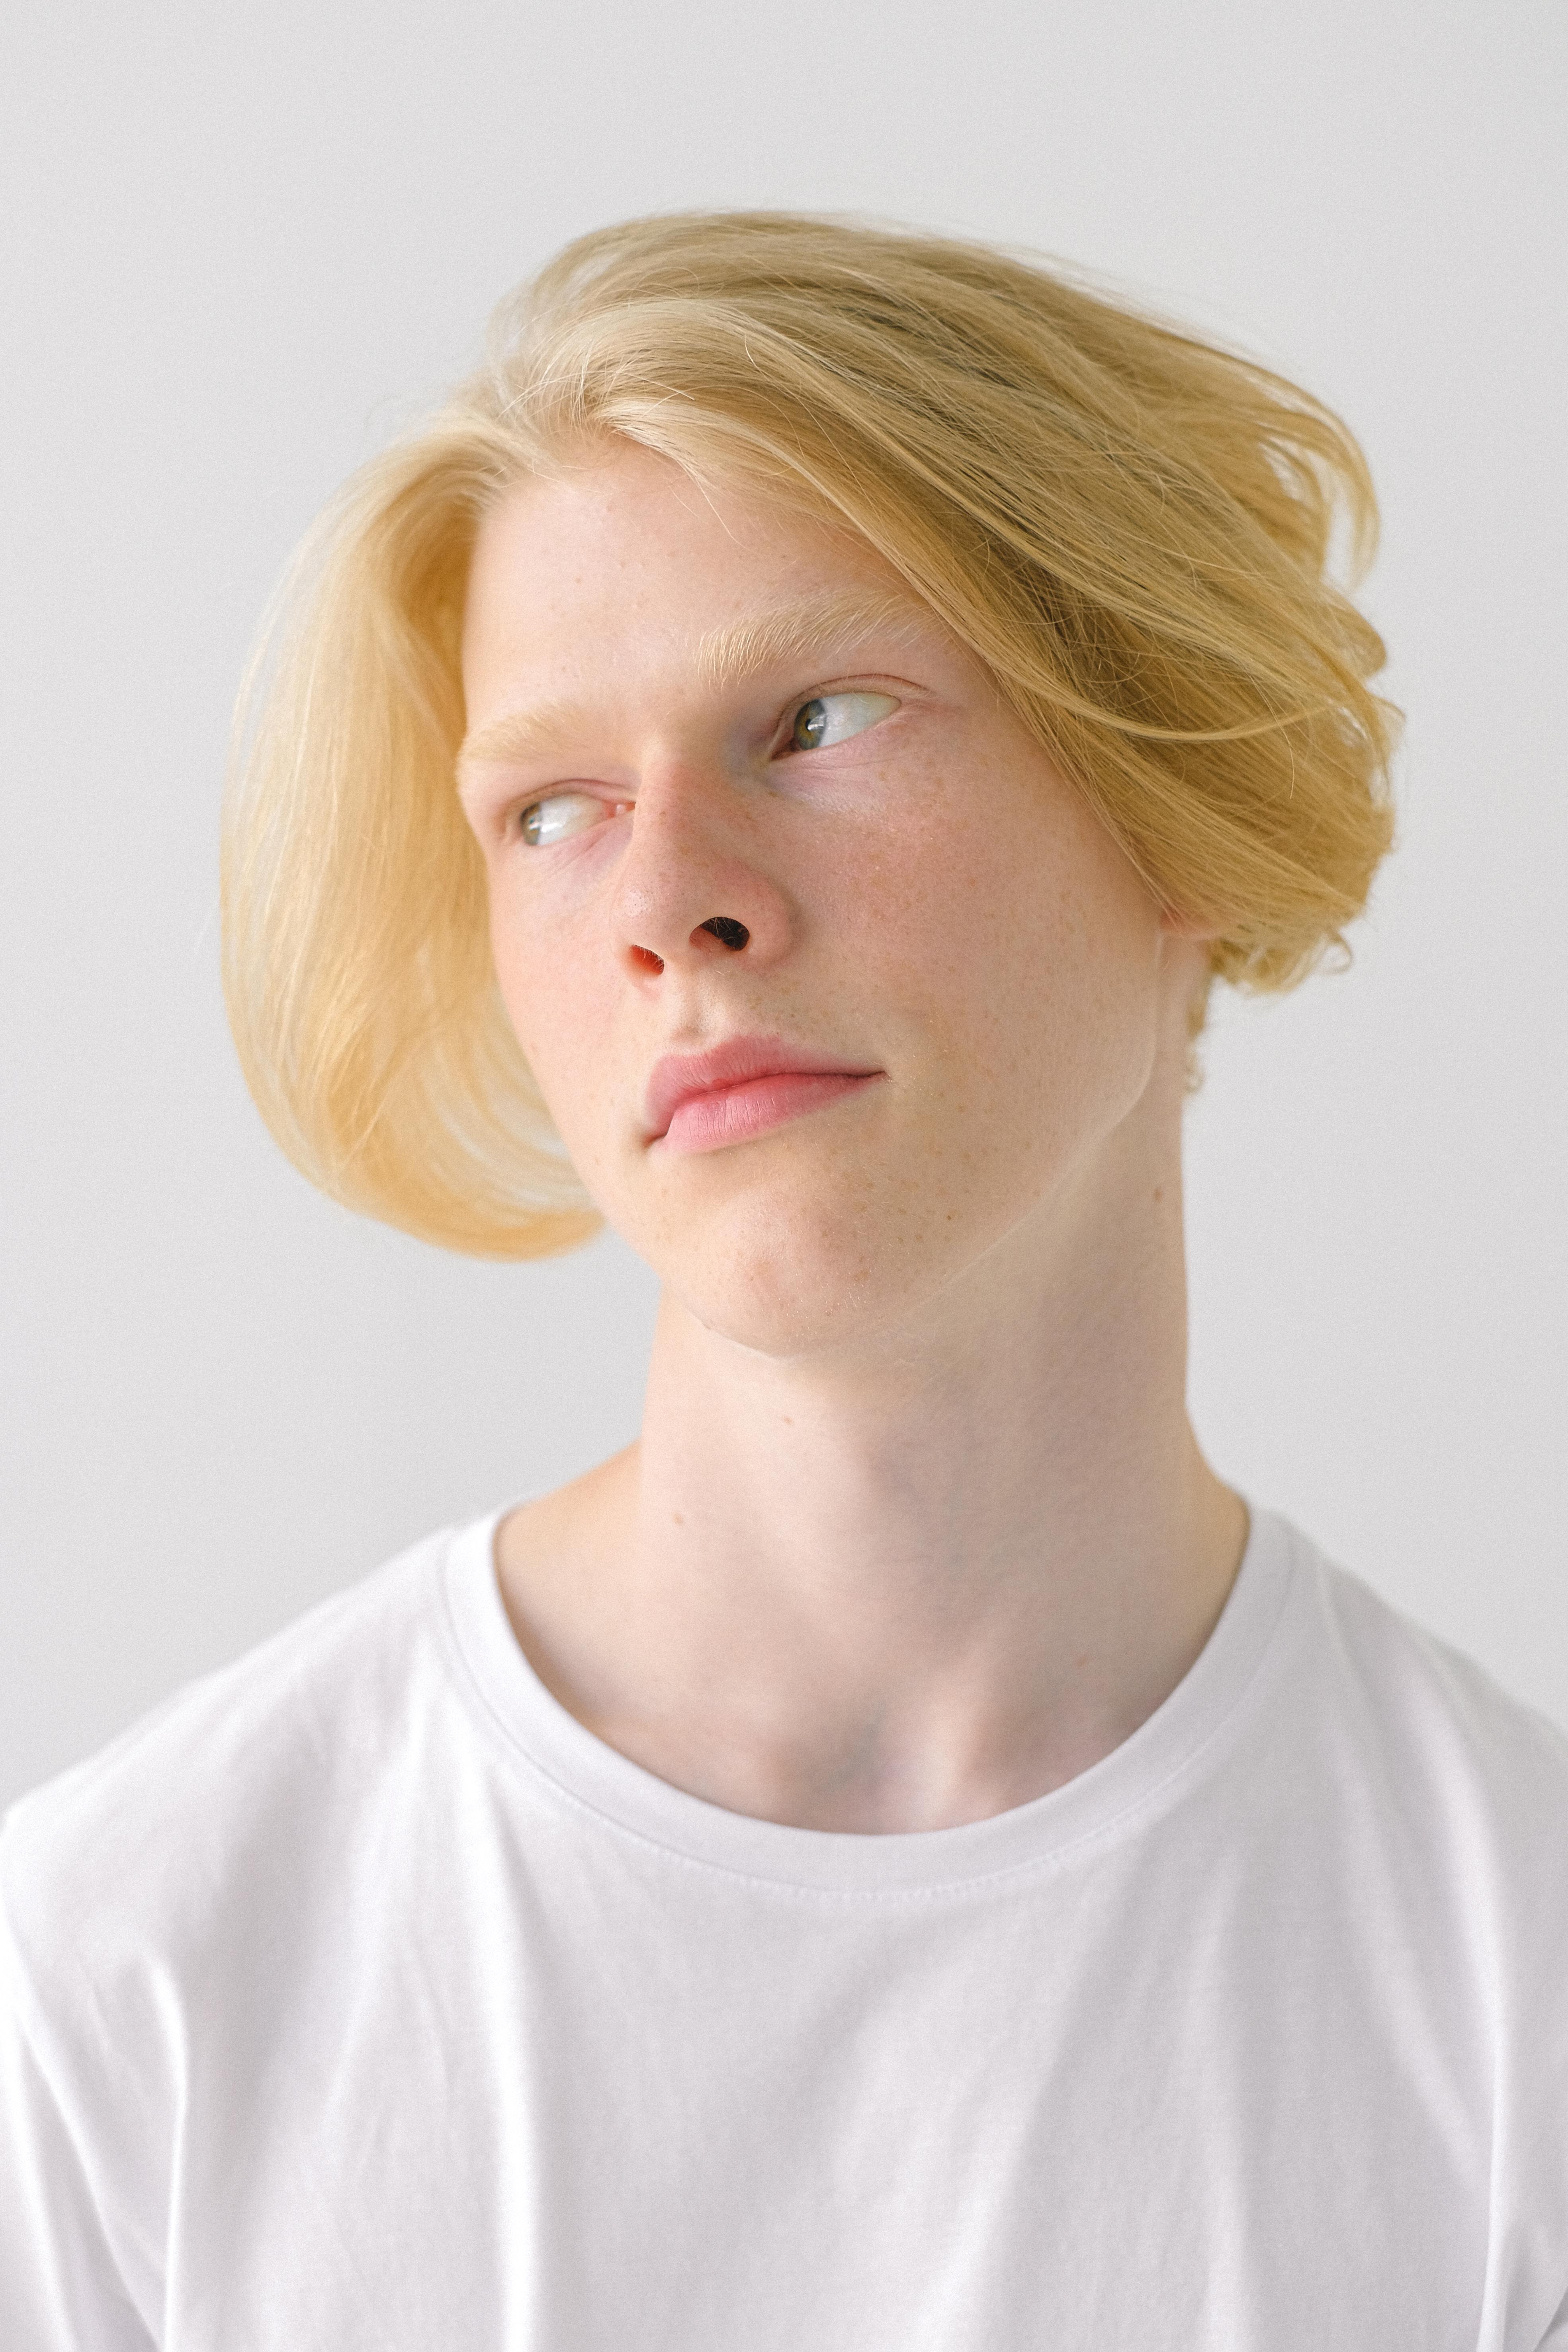 thoughtful teenage boy with stylish haircut